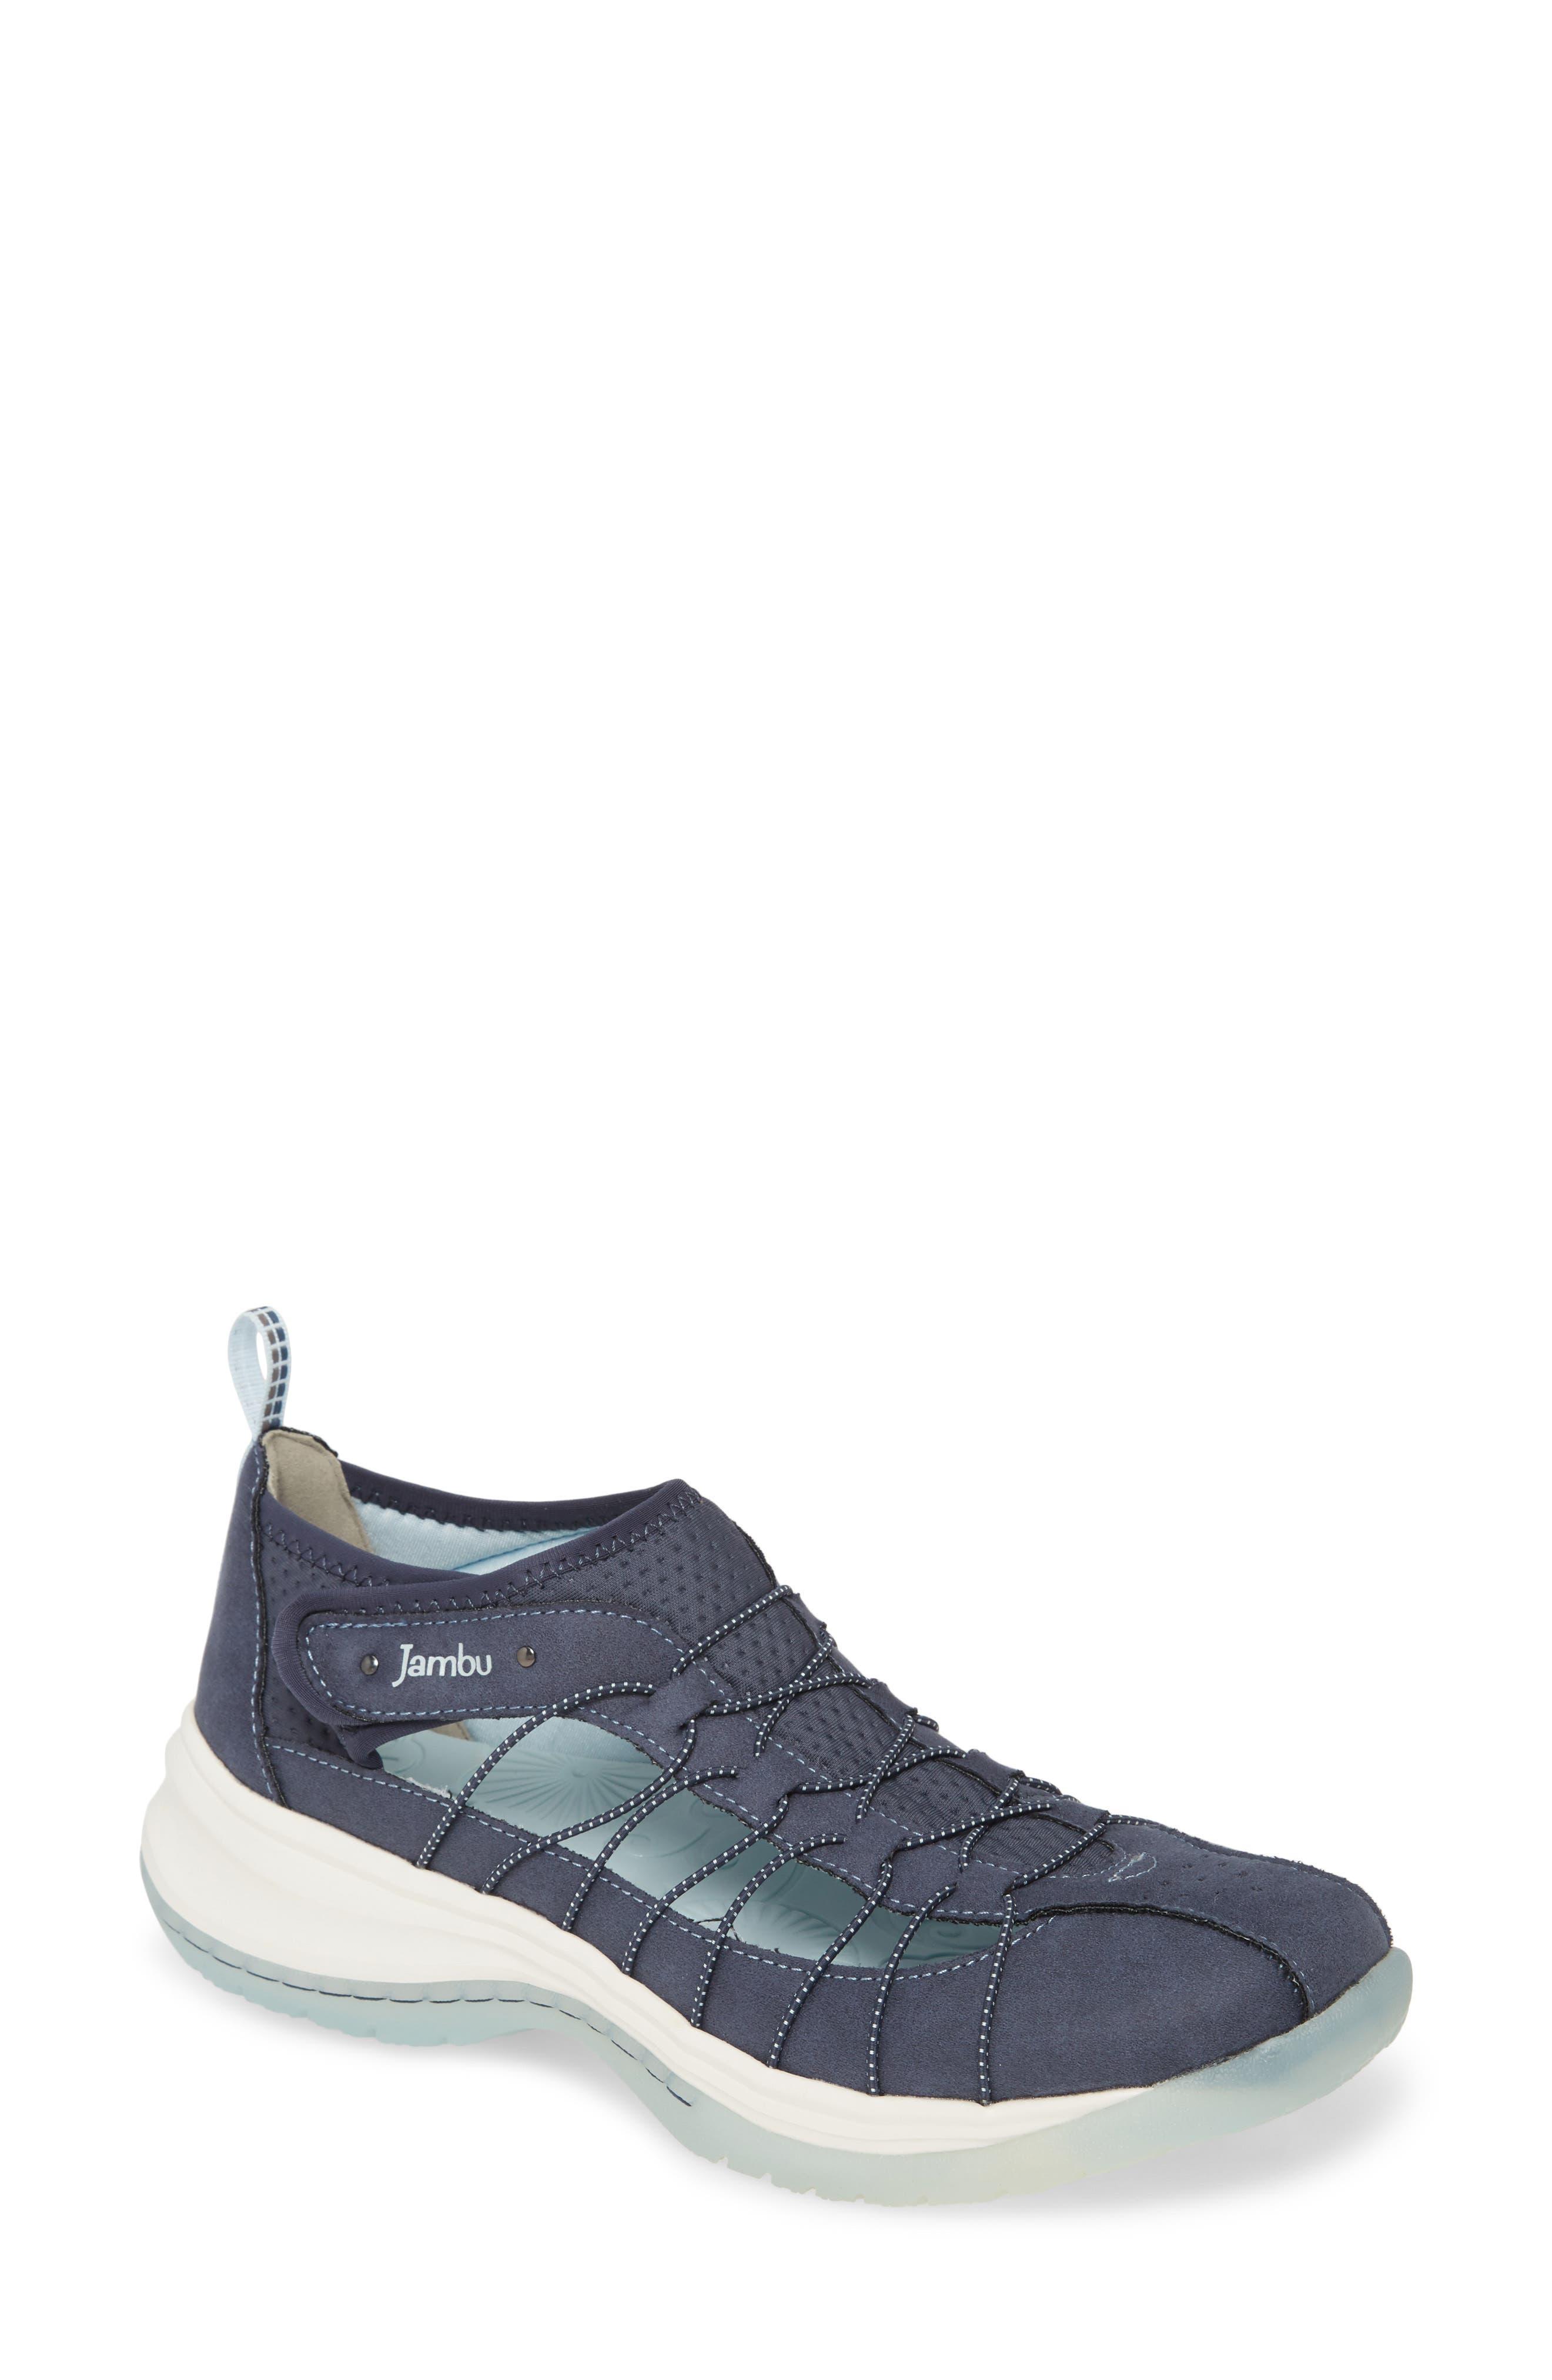 Free Spirit Encore Shoe